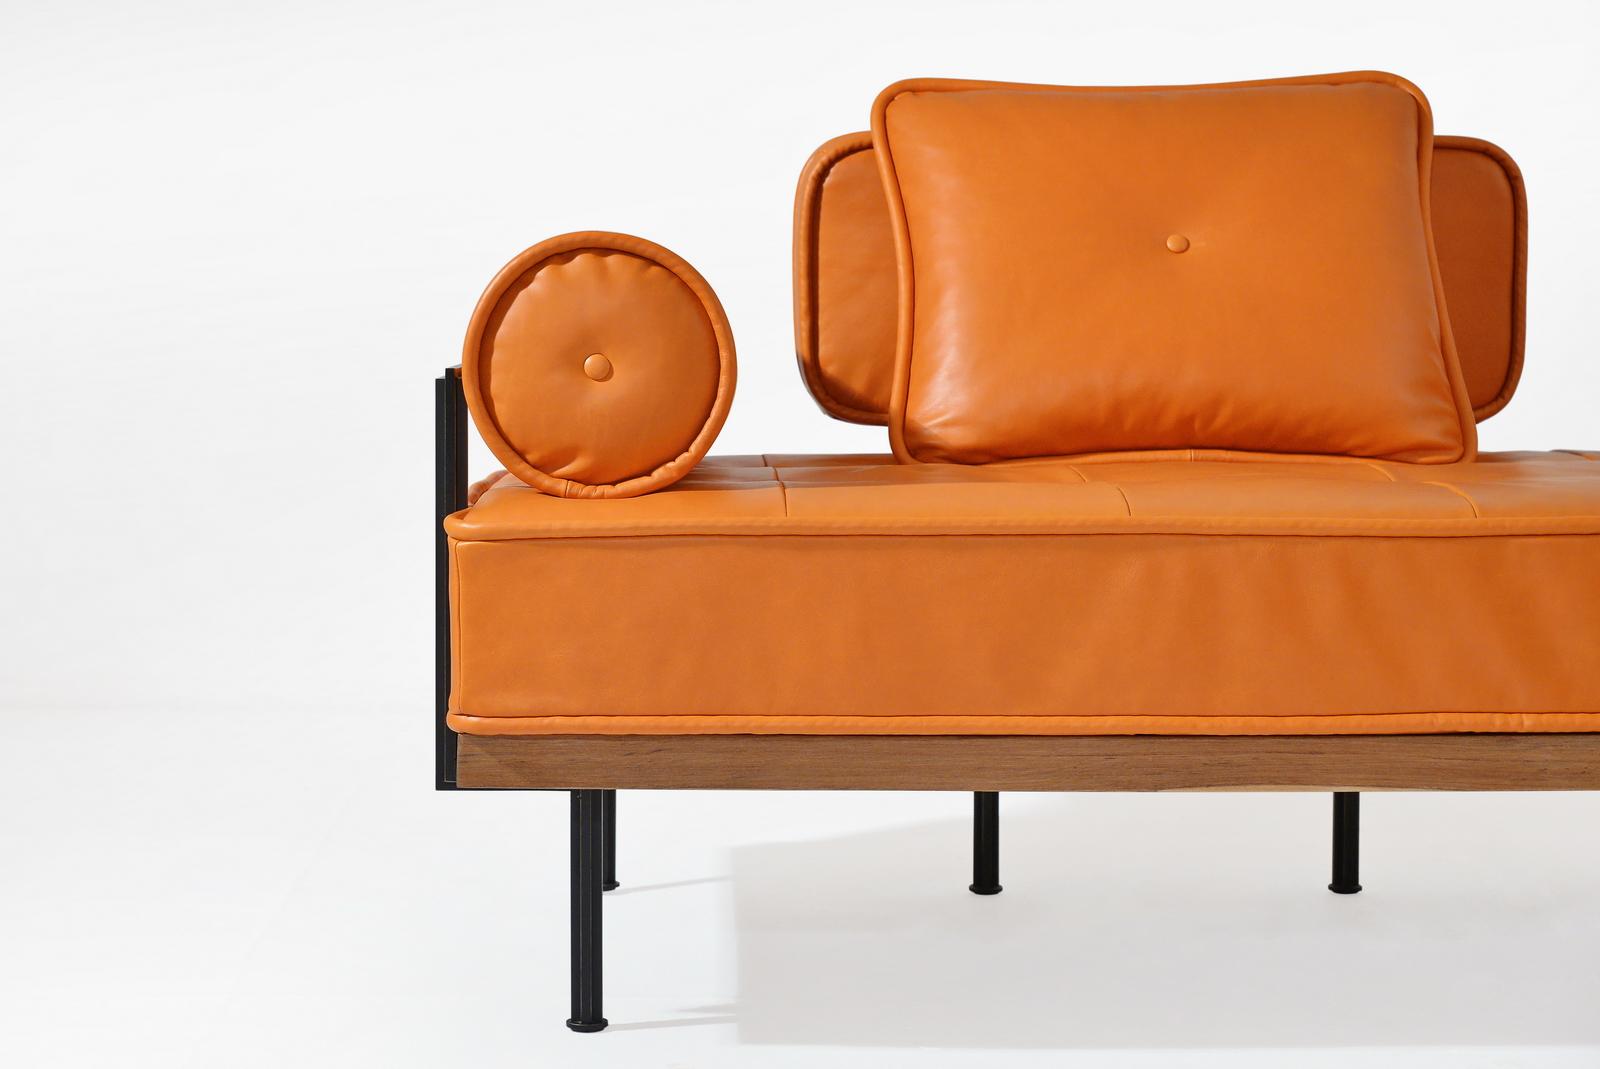 PTendercool-Sofa Corner-BS3-TE-BL-NO-Leather-210623-07